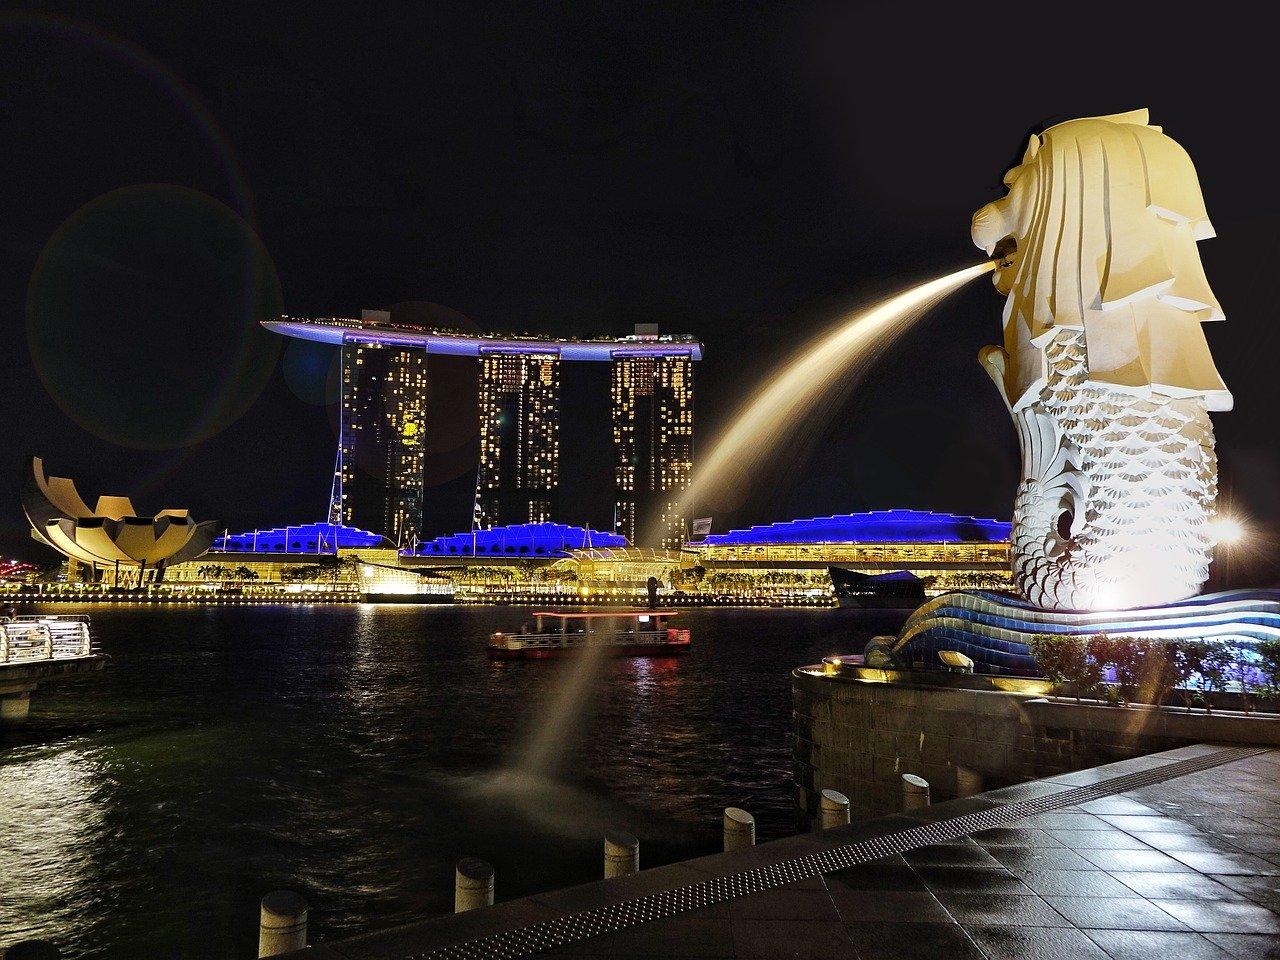 Ilustrasi merlion di Singapura. Photo by Jason Goh on Pixabay